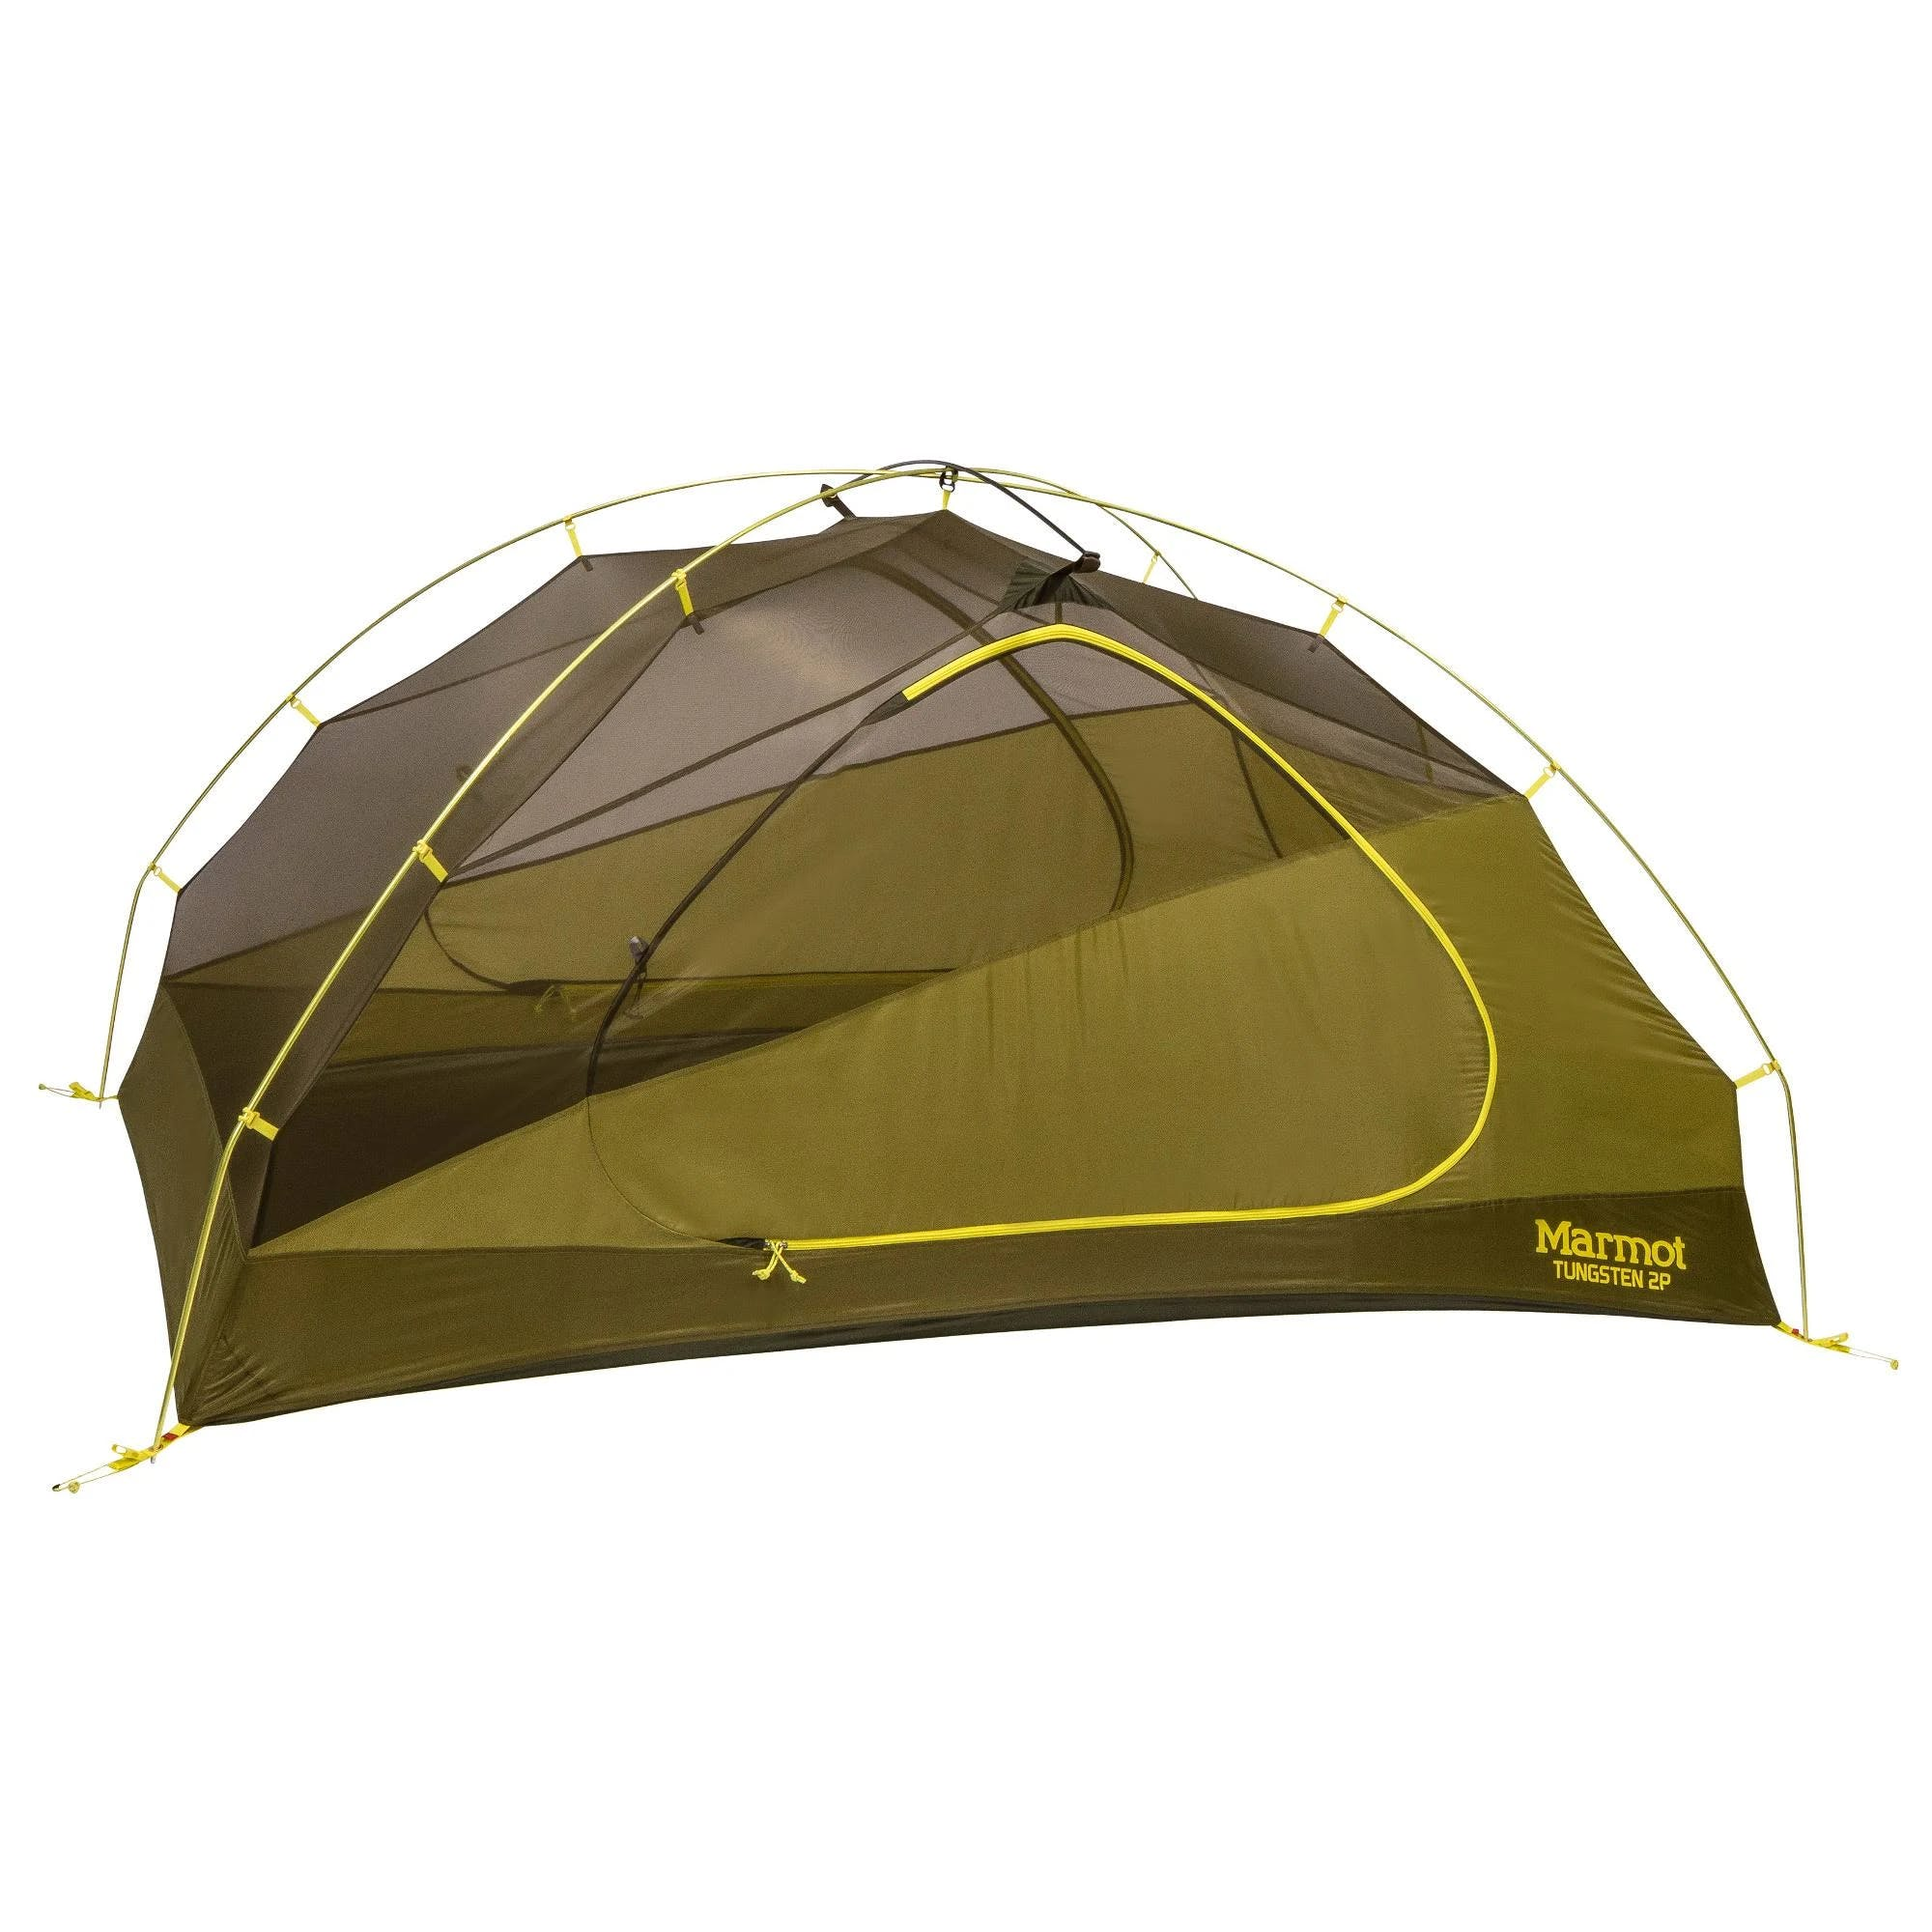 Marmot Tungsten 2-Person Tent, Green Shadow/Moss